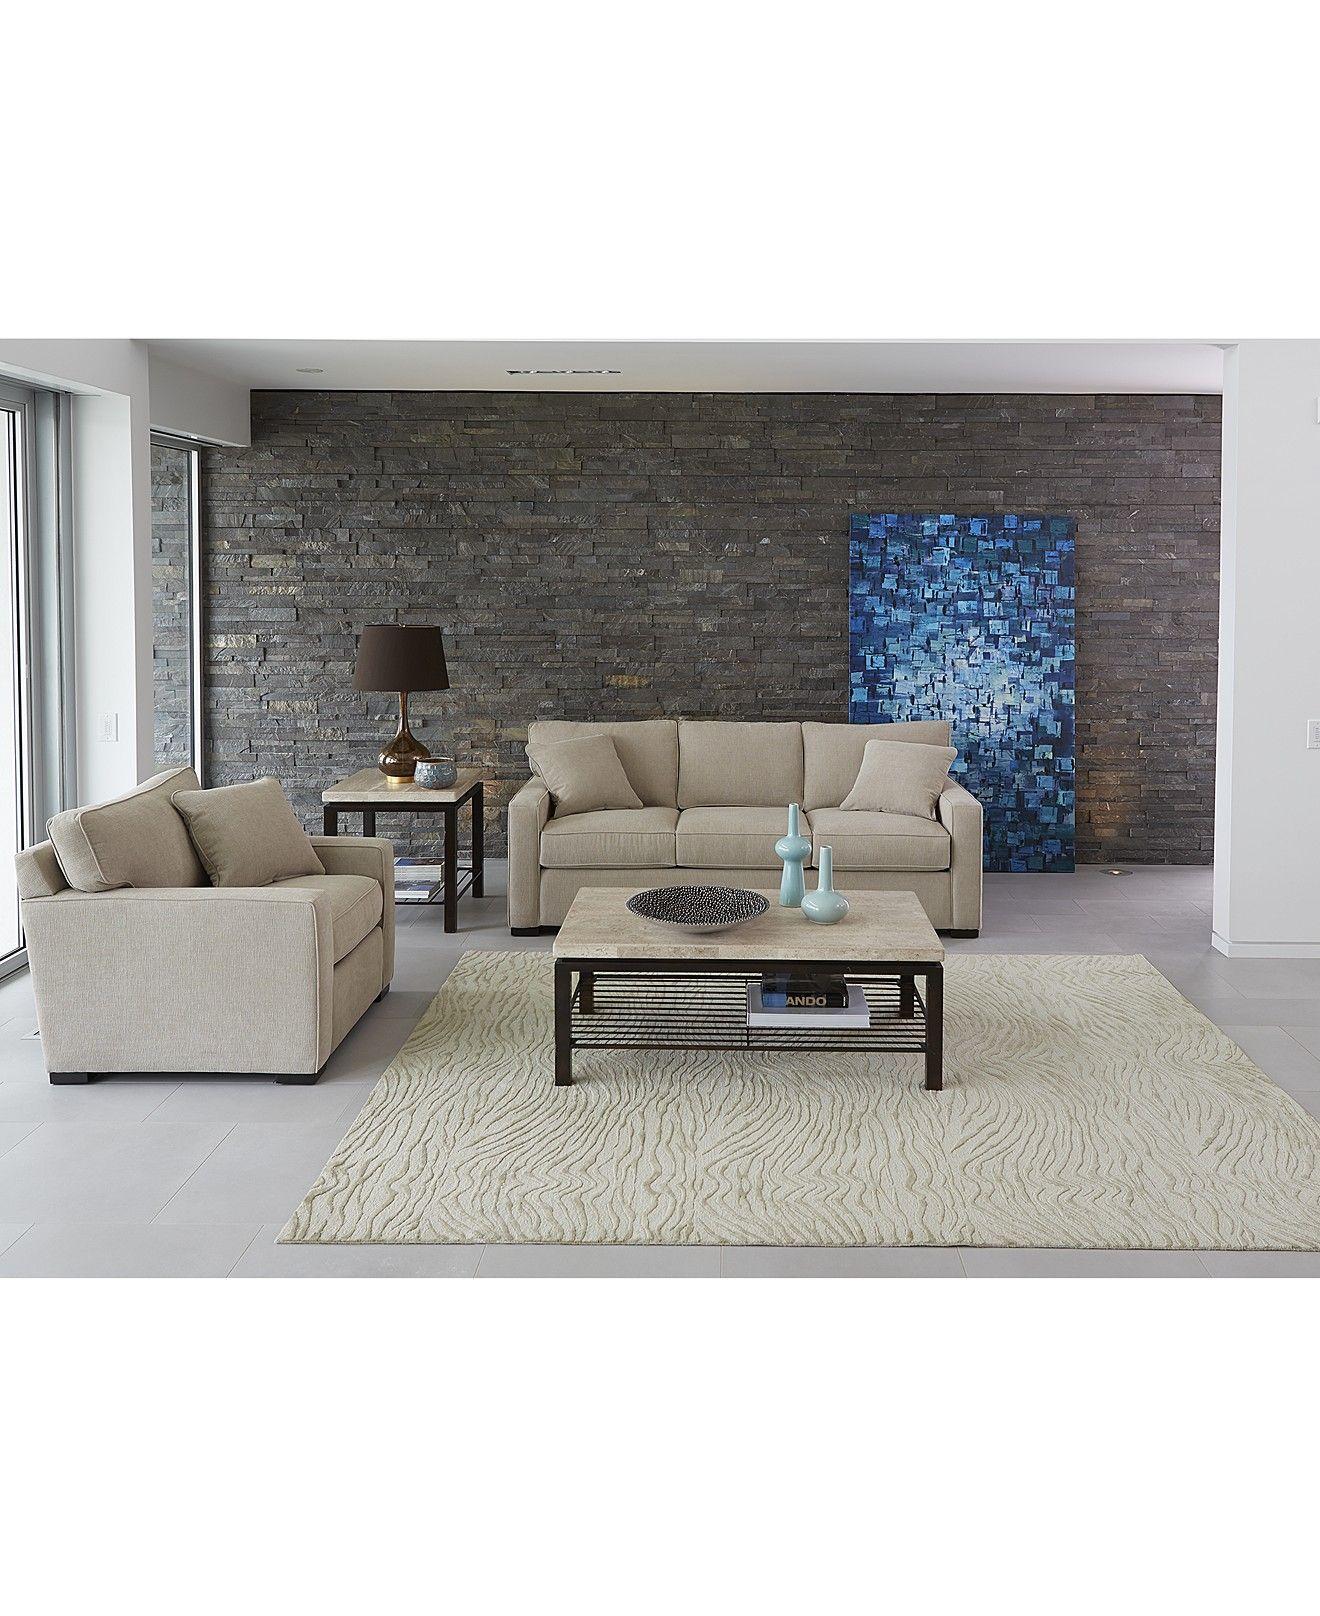 Radley Fabric Sofa Collection, Created For Macyu0027s   Furniture   Macyu0027s